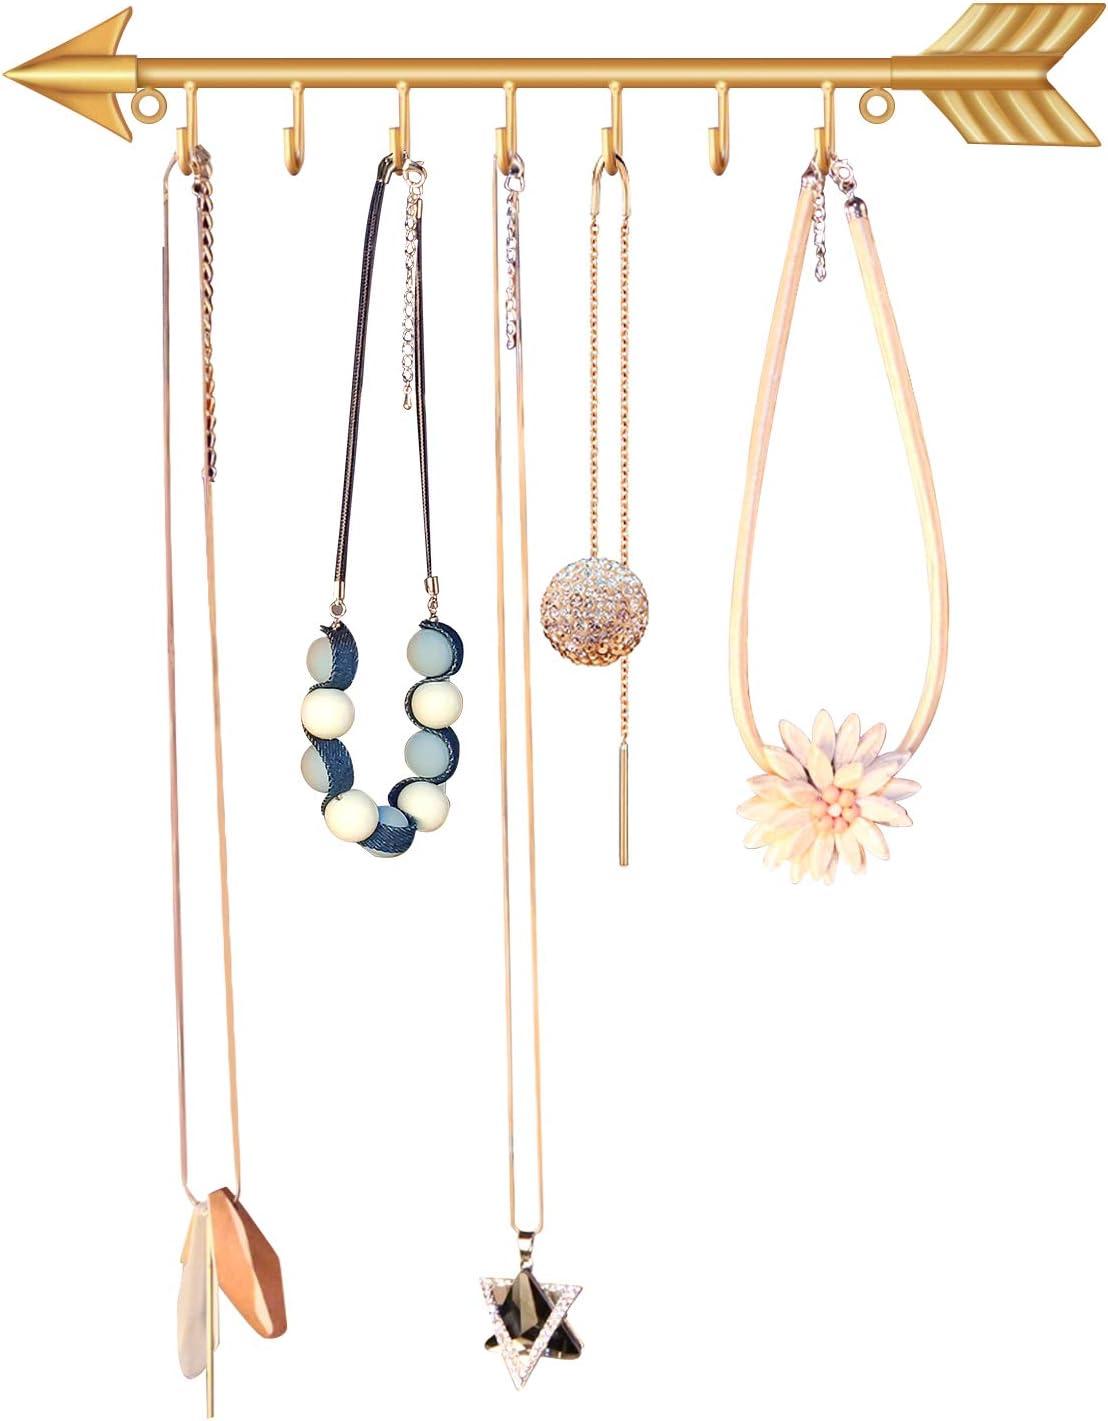 Modern Decor Wall Key Holders Rack Jewellery Organizer